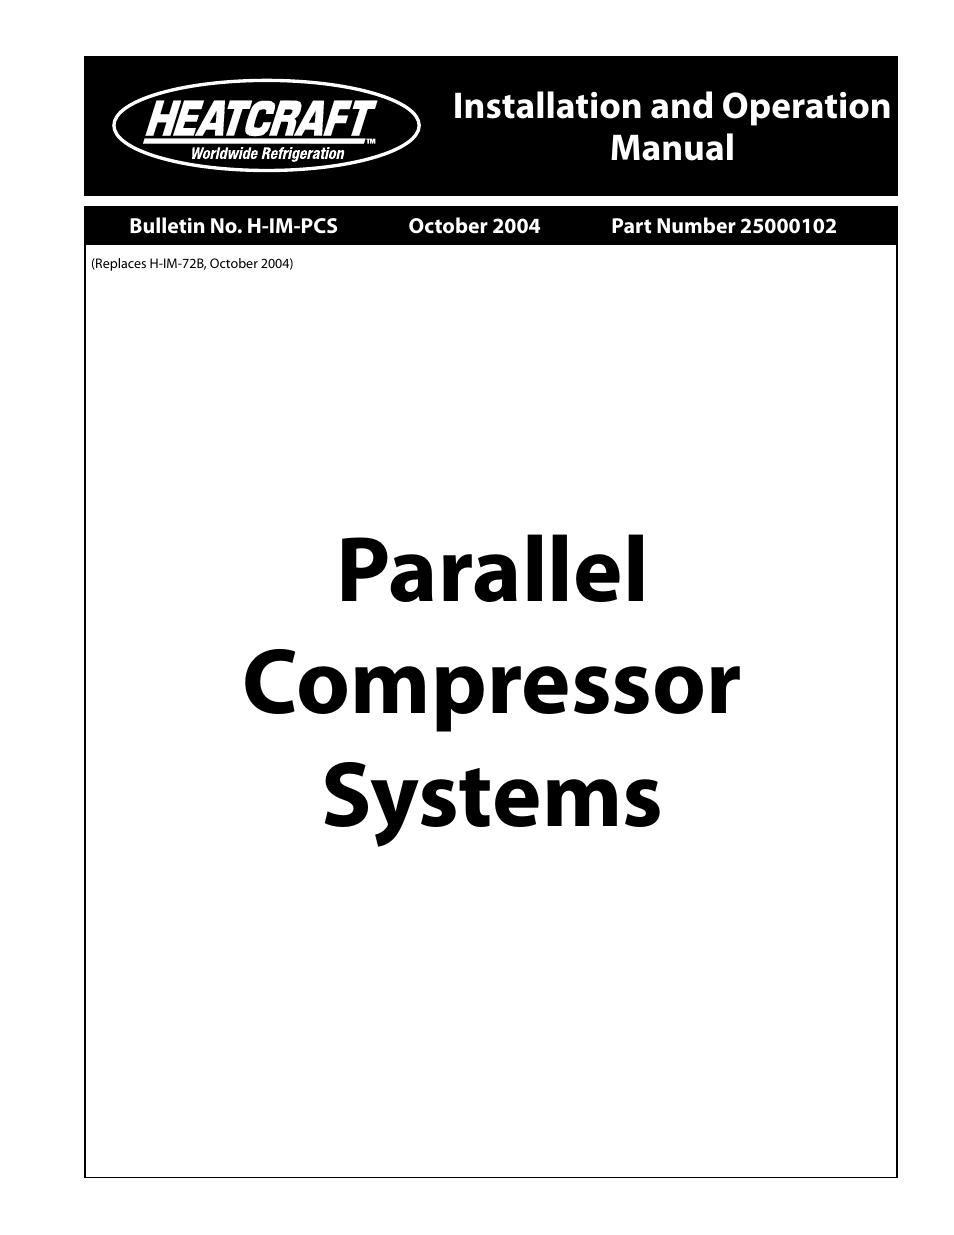 Heatcraft Refrigeration Products PARALLEL COMPRESSOR